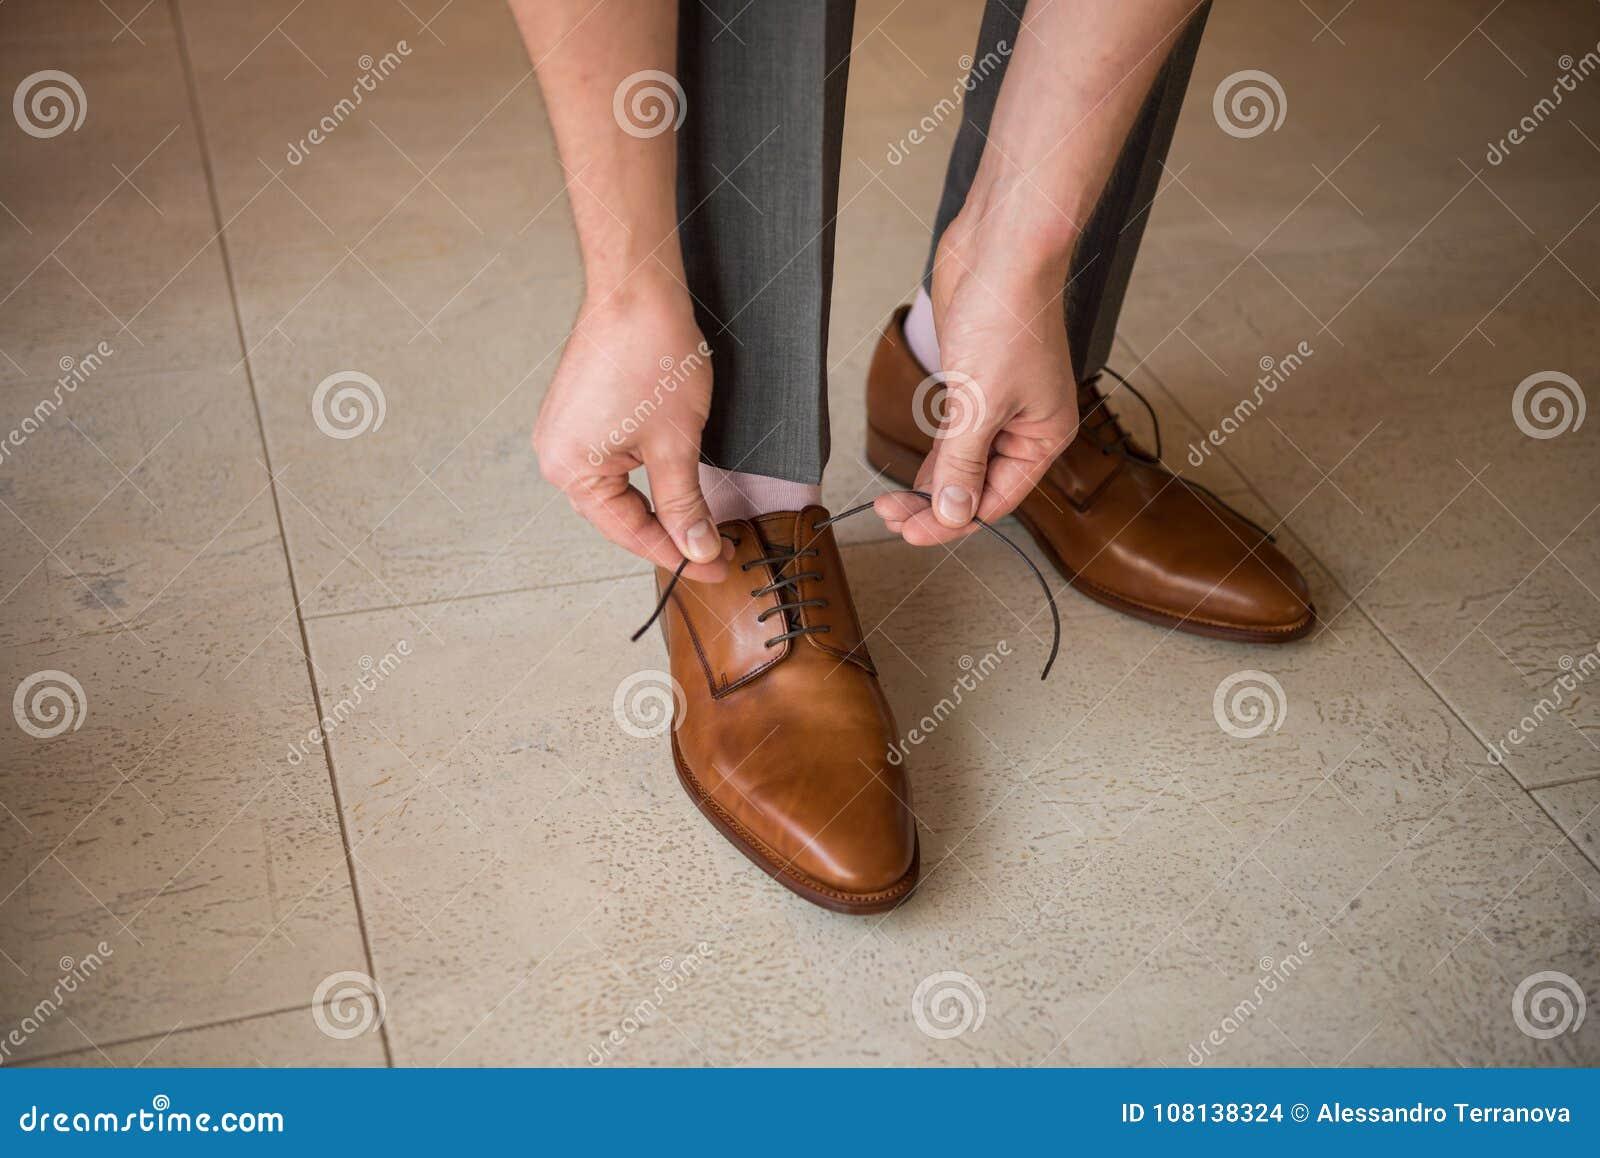 Wedding shoes and husband